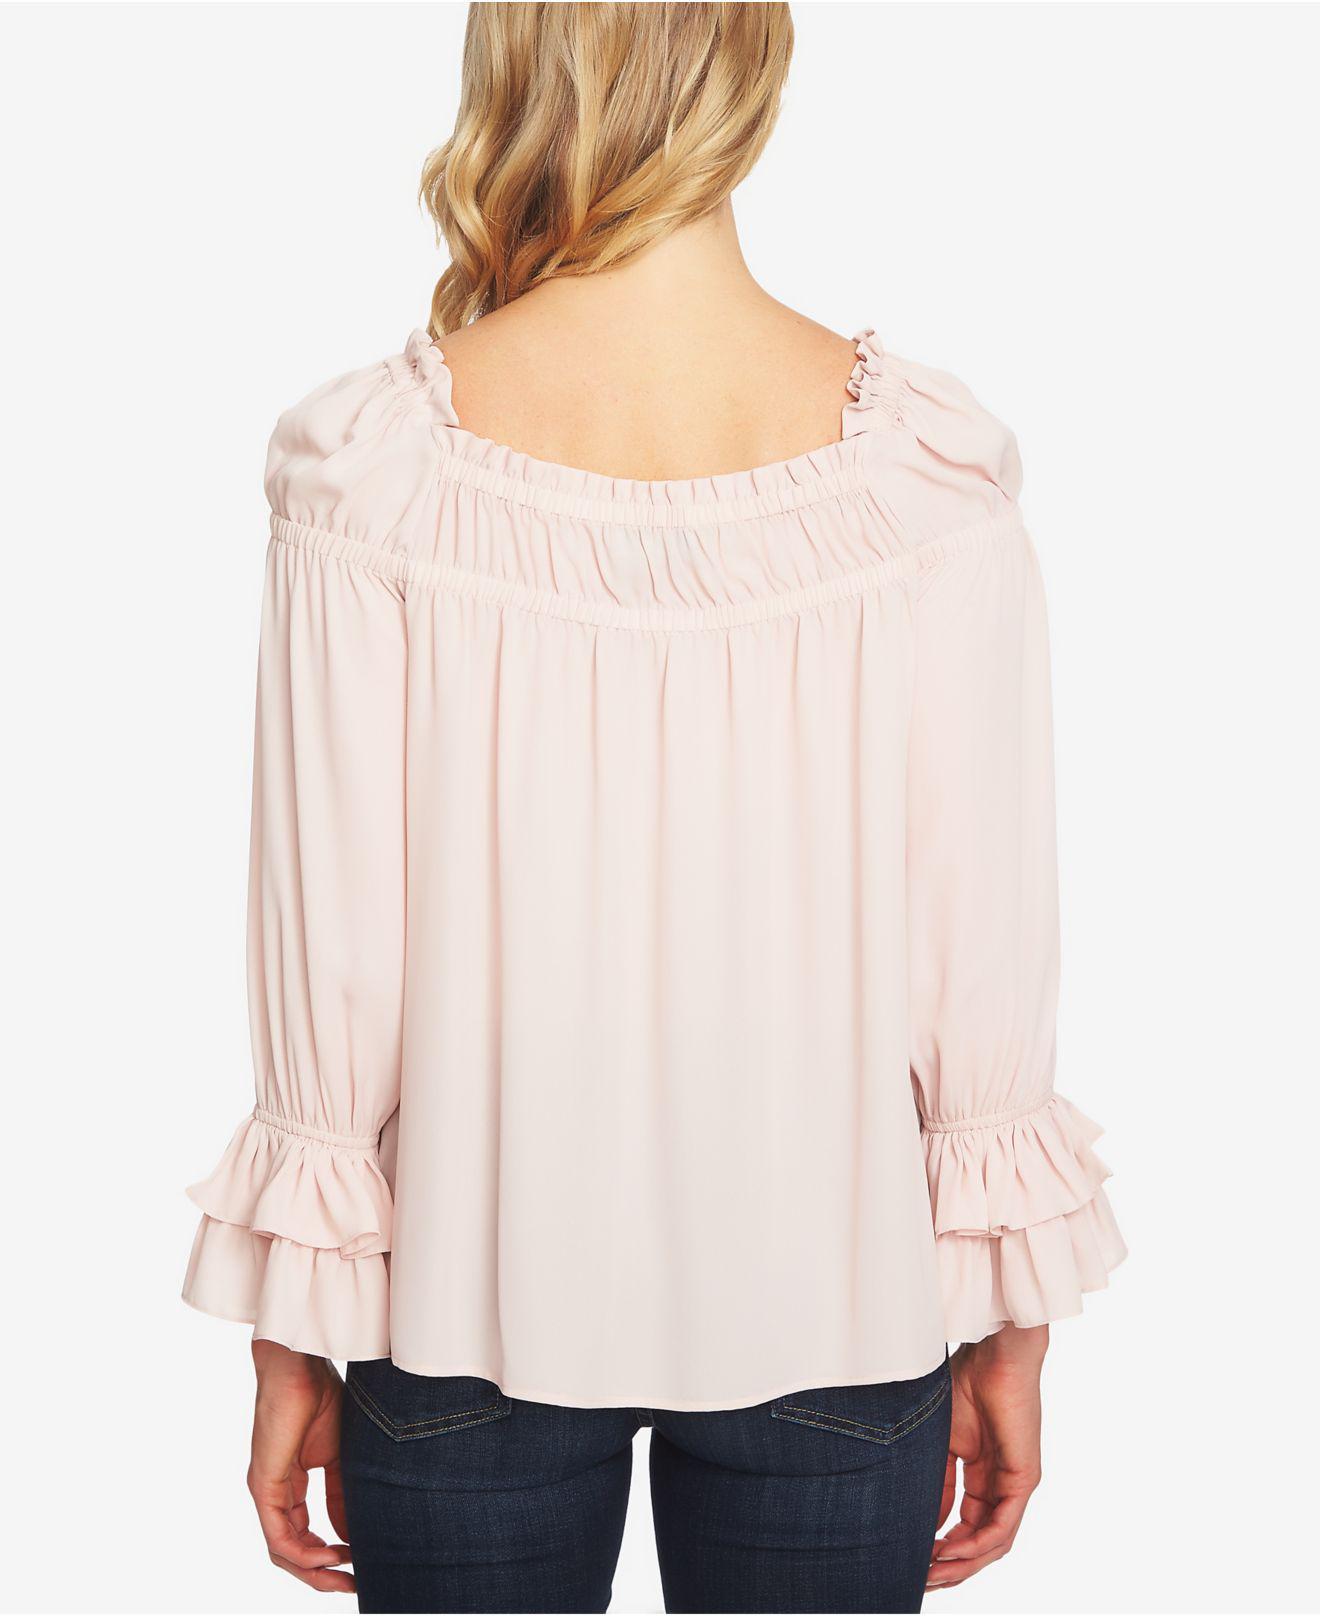 b2d4be8df79a3b Cece Ruffled Puff-shoulder Top in Pink - Lyst